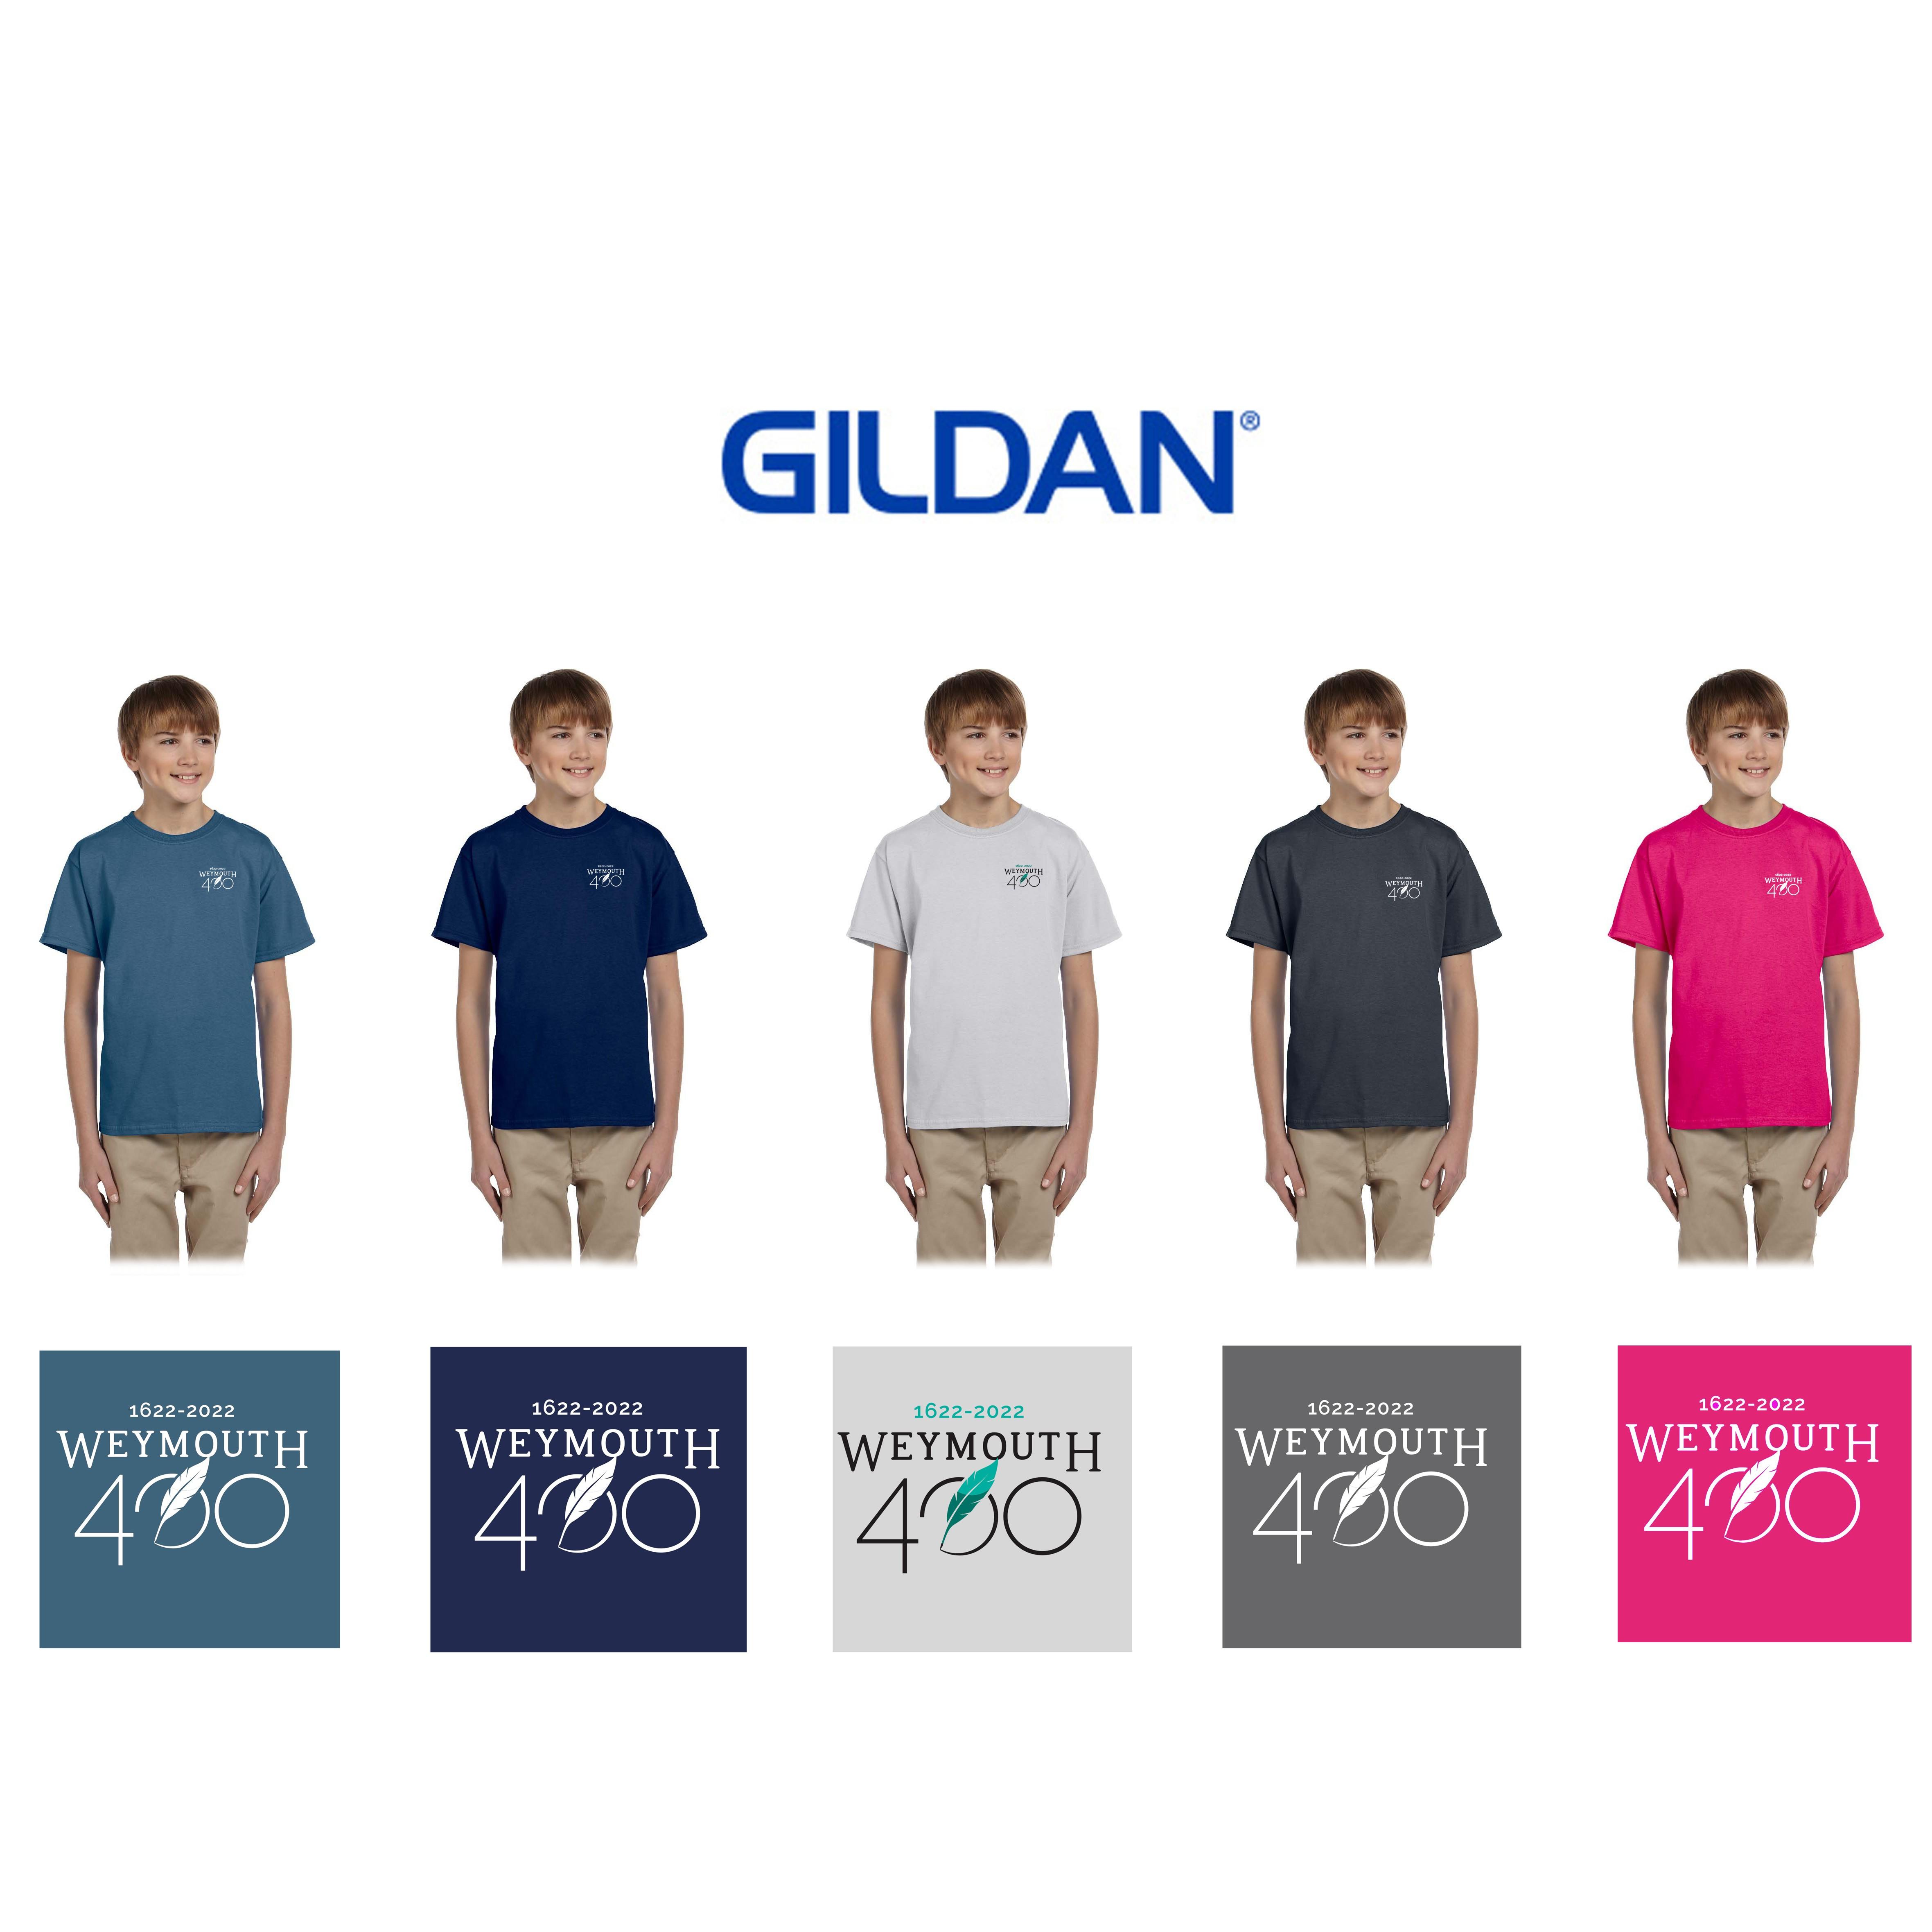 Weymouth 400 Gildan Youth Ultra Cotton® 6 oz. T-Shirt, Embroidered